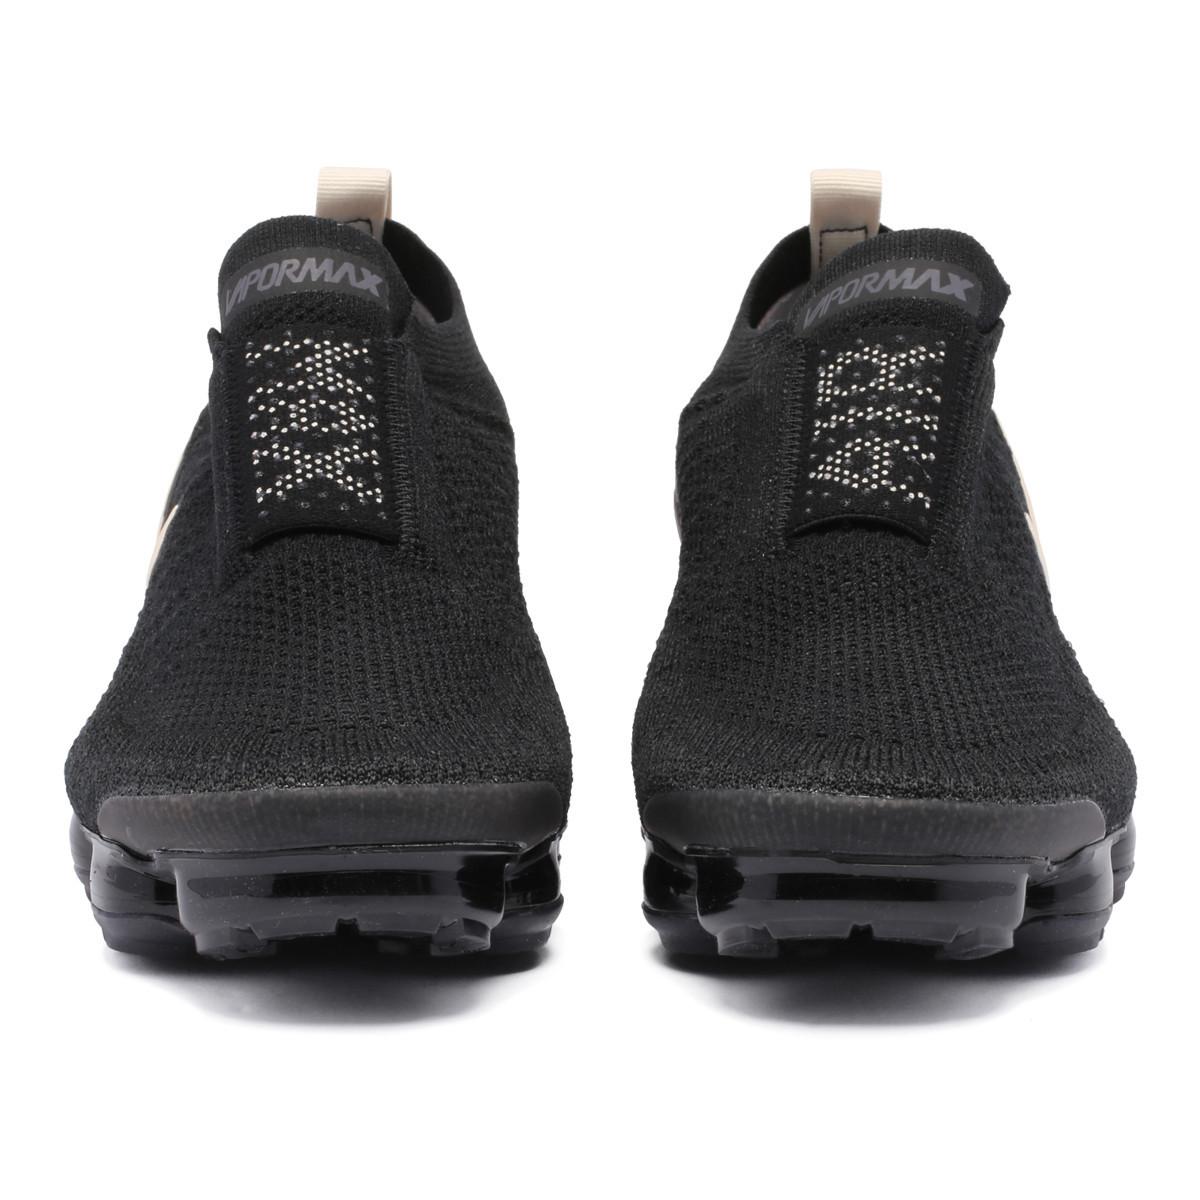 311729a4c465 Nike Air VaporMax Moc 2 (Black  Light Cream  White Thunder Grey) Men